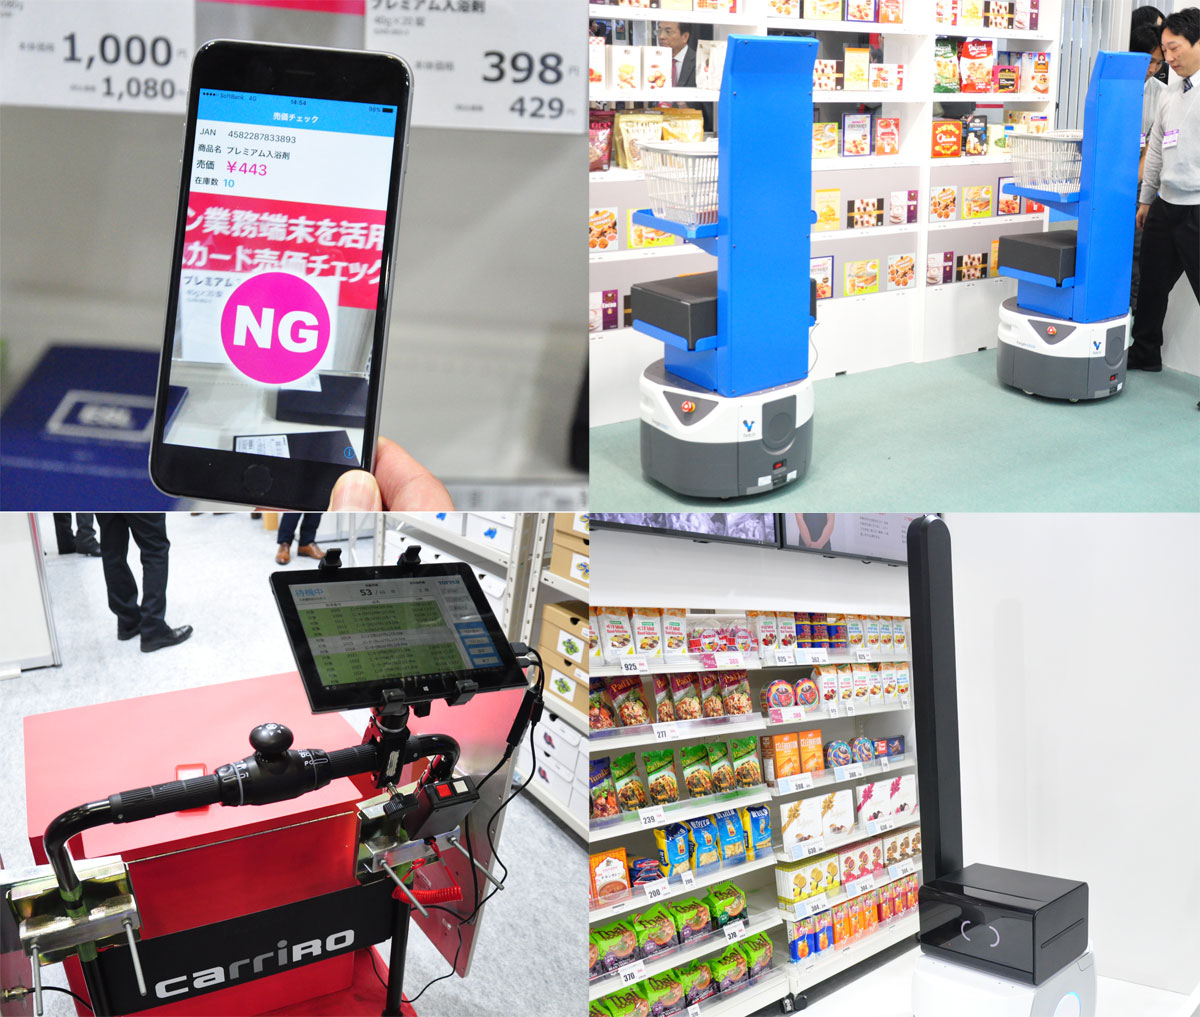 AI、ロボット活用の現実解が多数! リテールテックで展示された店舗支援技術